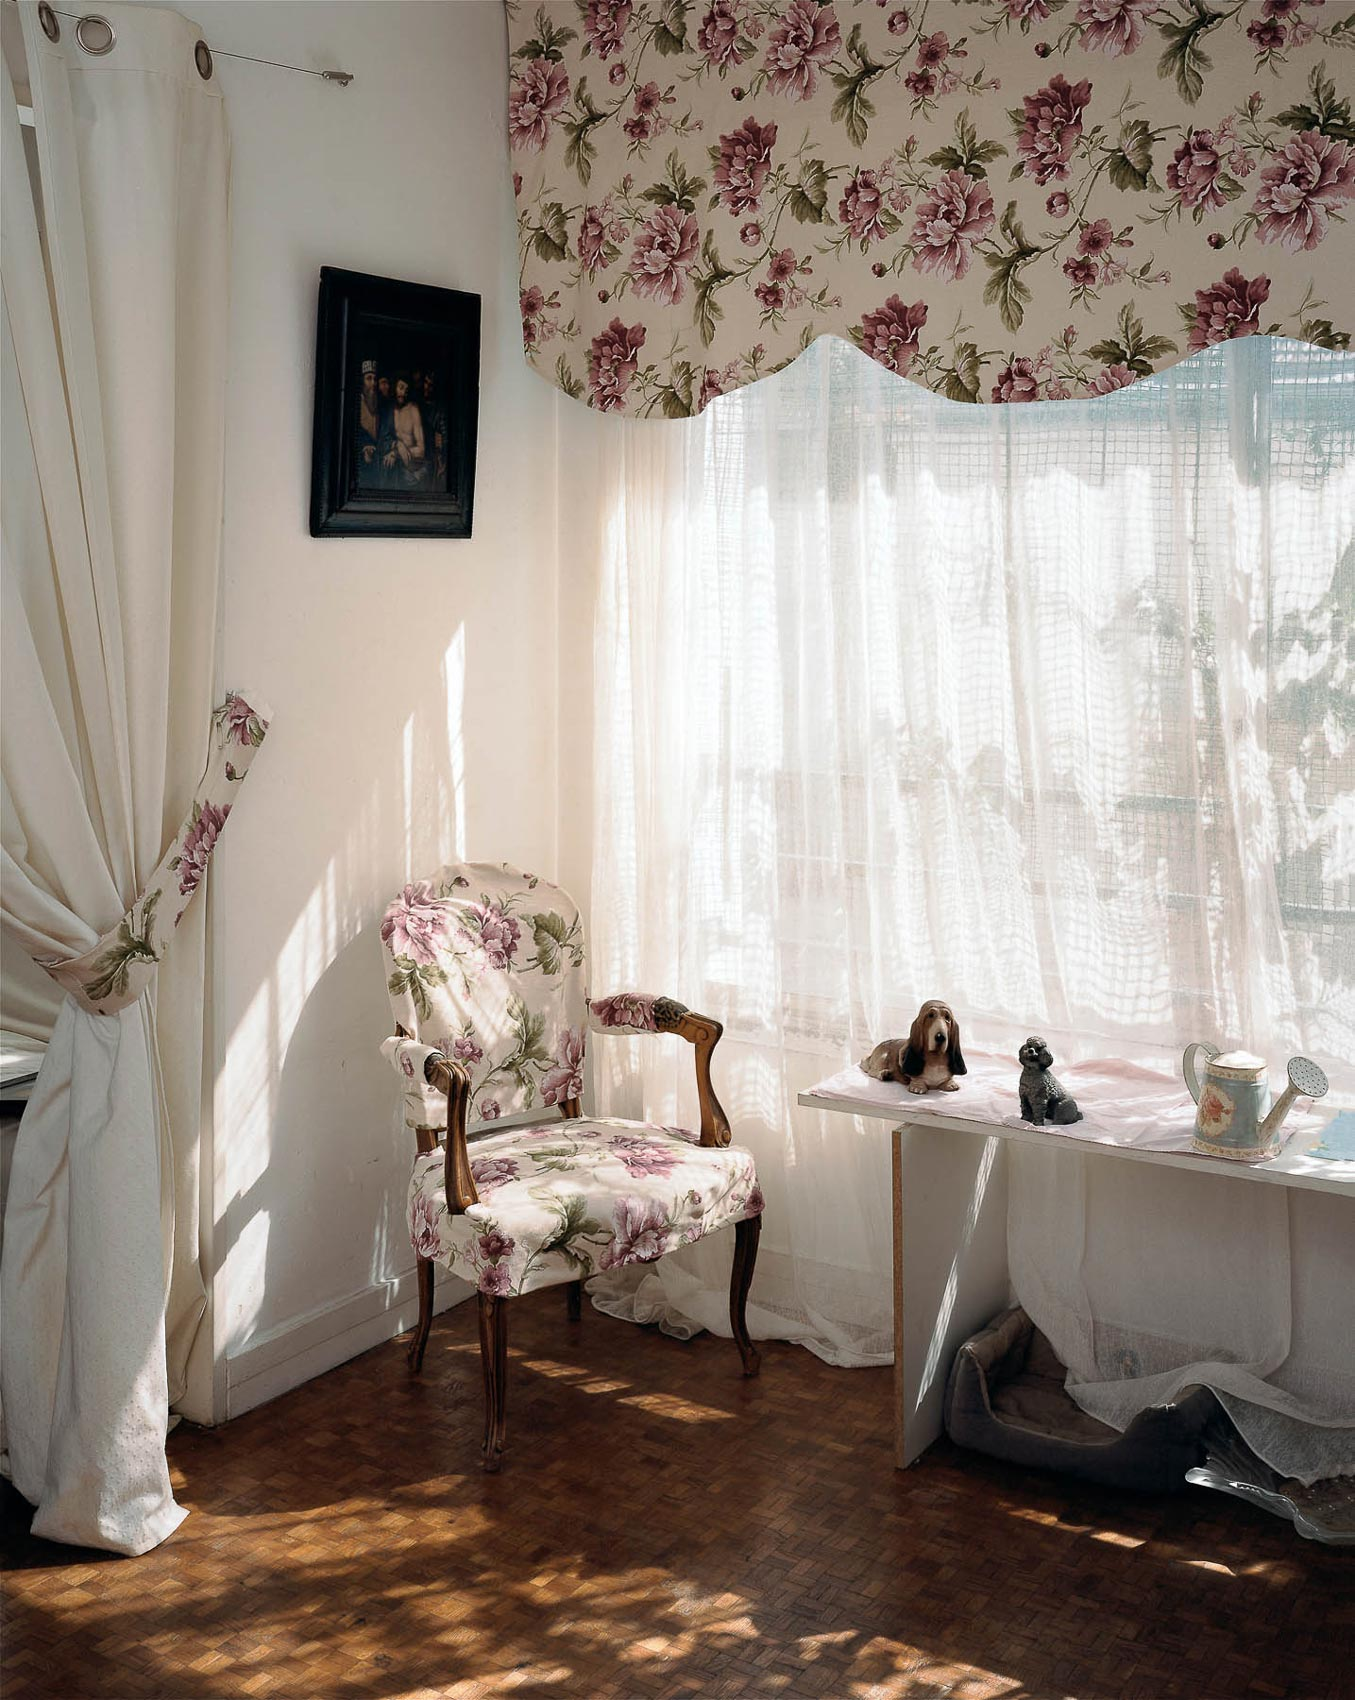 02_david_picchiottino_window_windows_fenetre-15.jpg